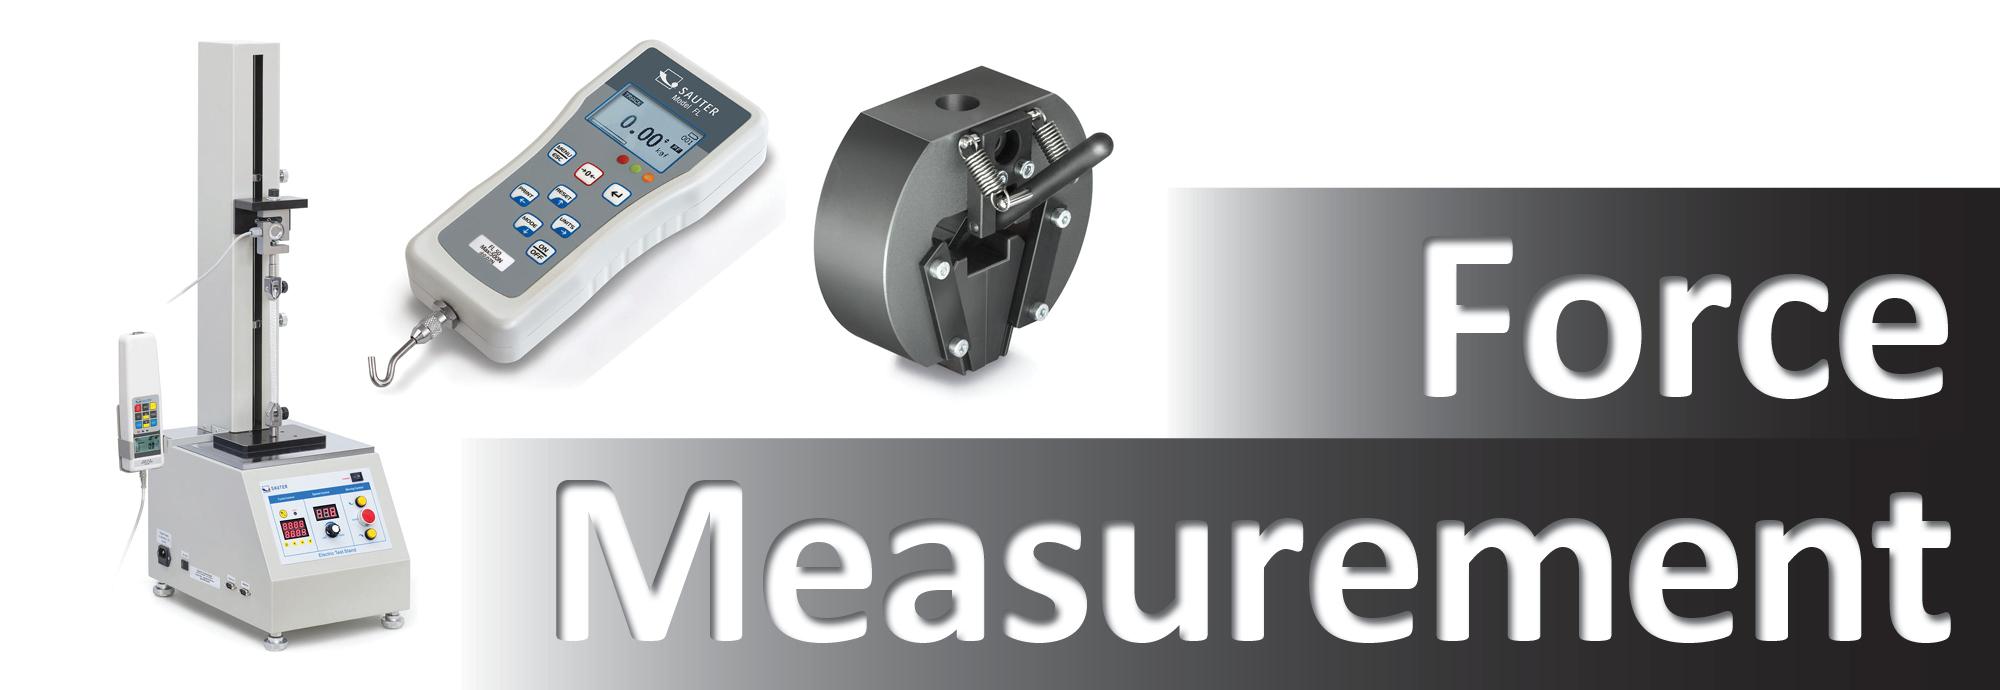 Complete range of force gauges and test stands